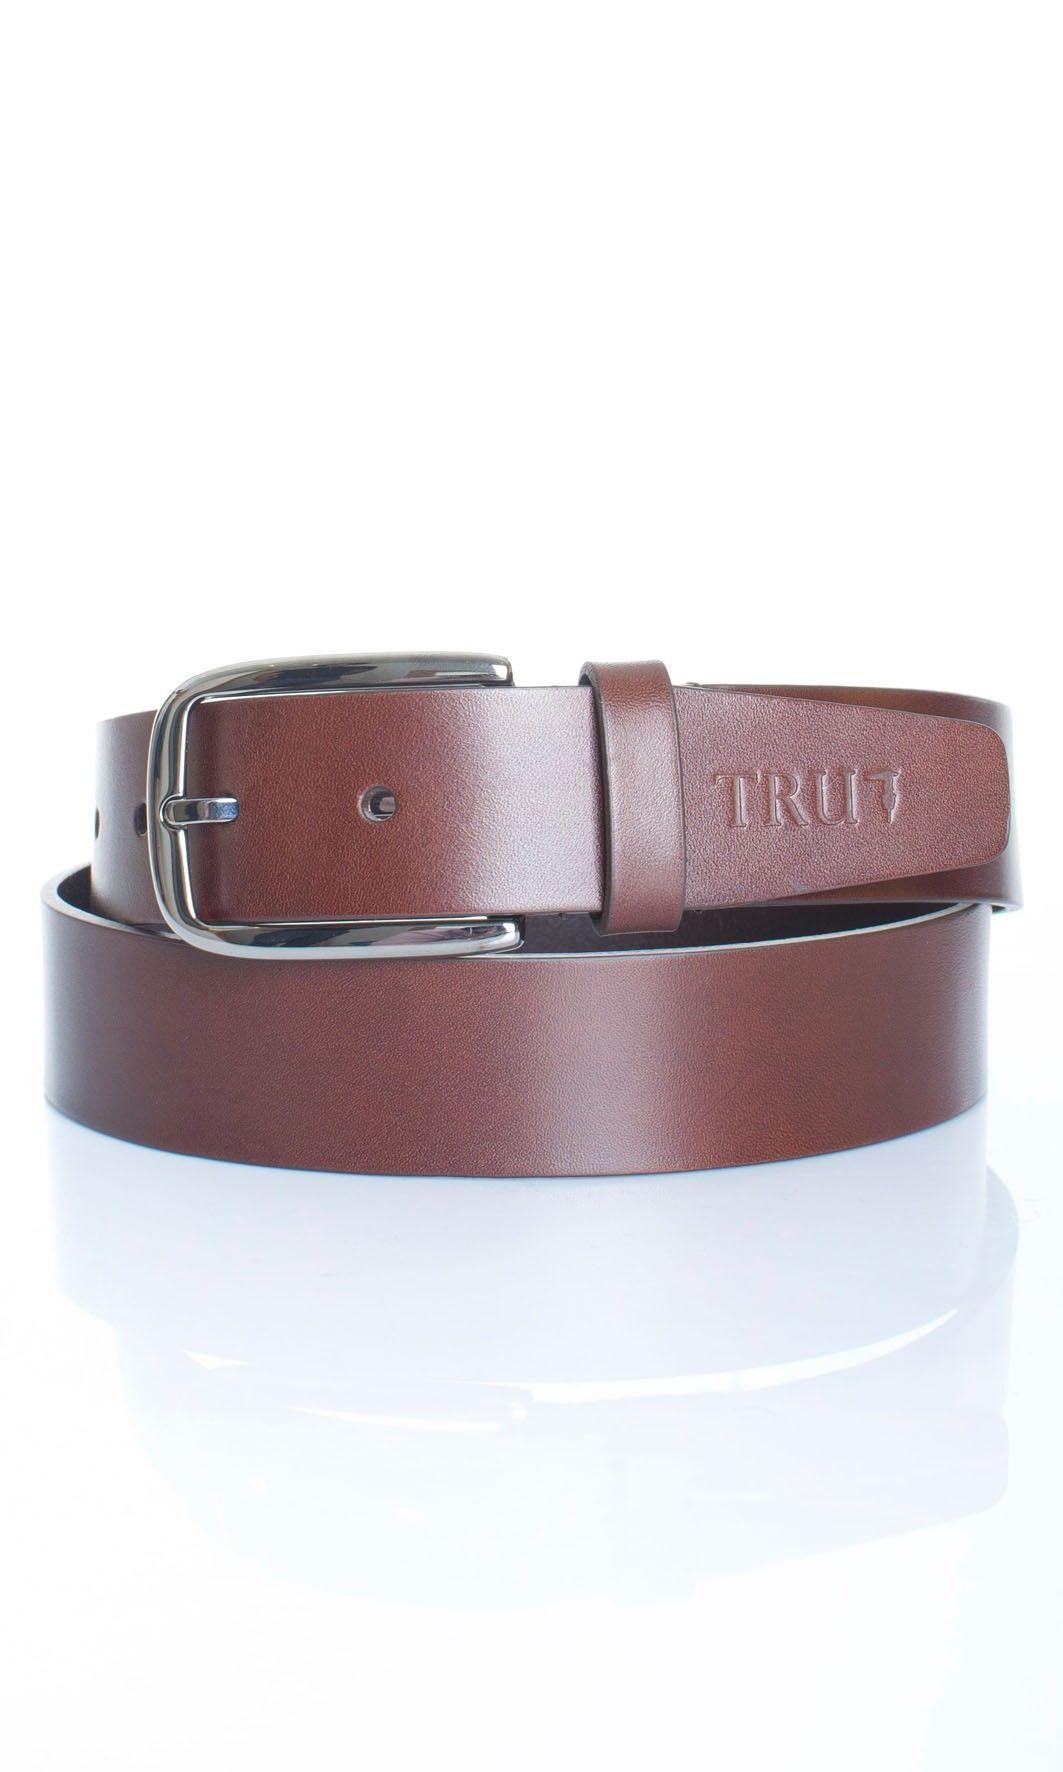 Tru Trussardi | Cintura In Vitello Tru Trussardi Uomo Col. Marrone - Shop Online su Dursoboutique.com 52C015J336